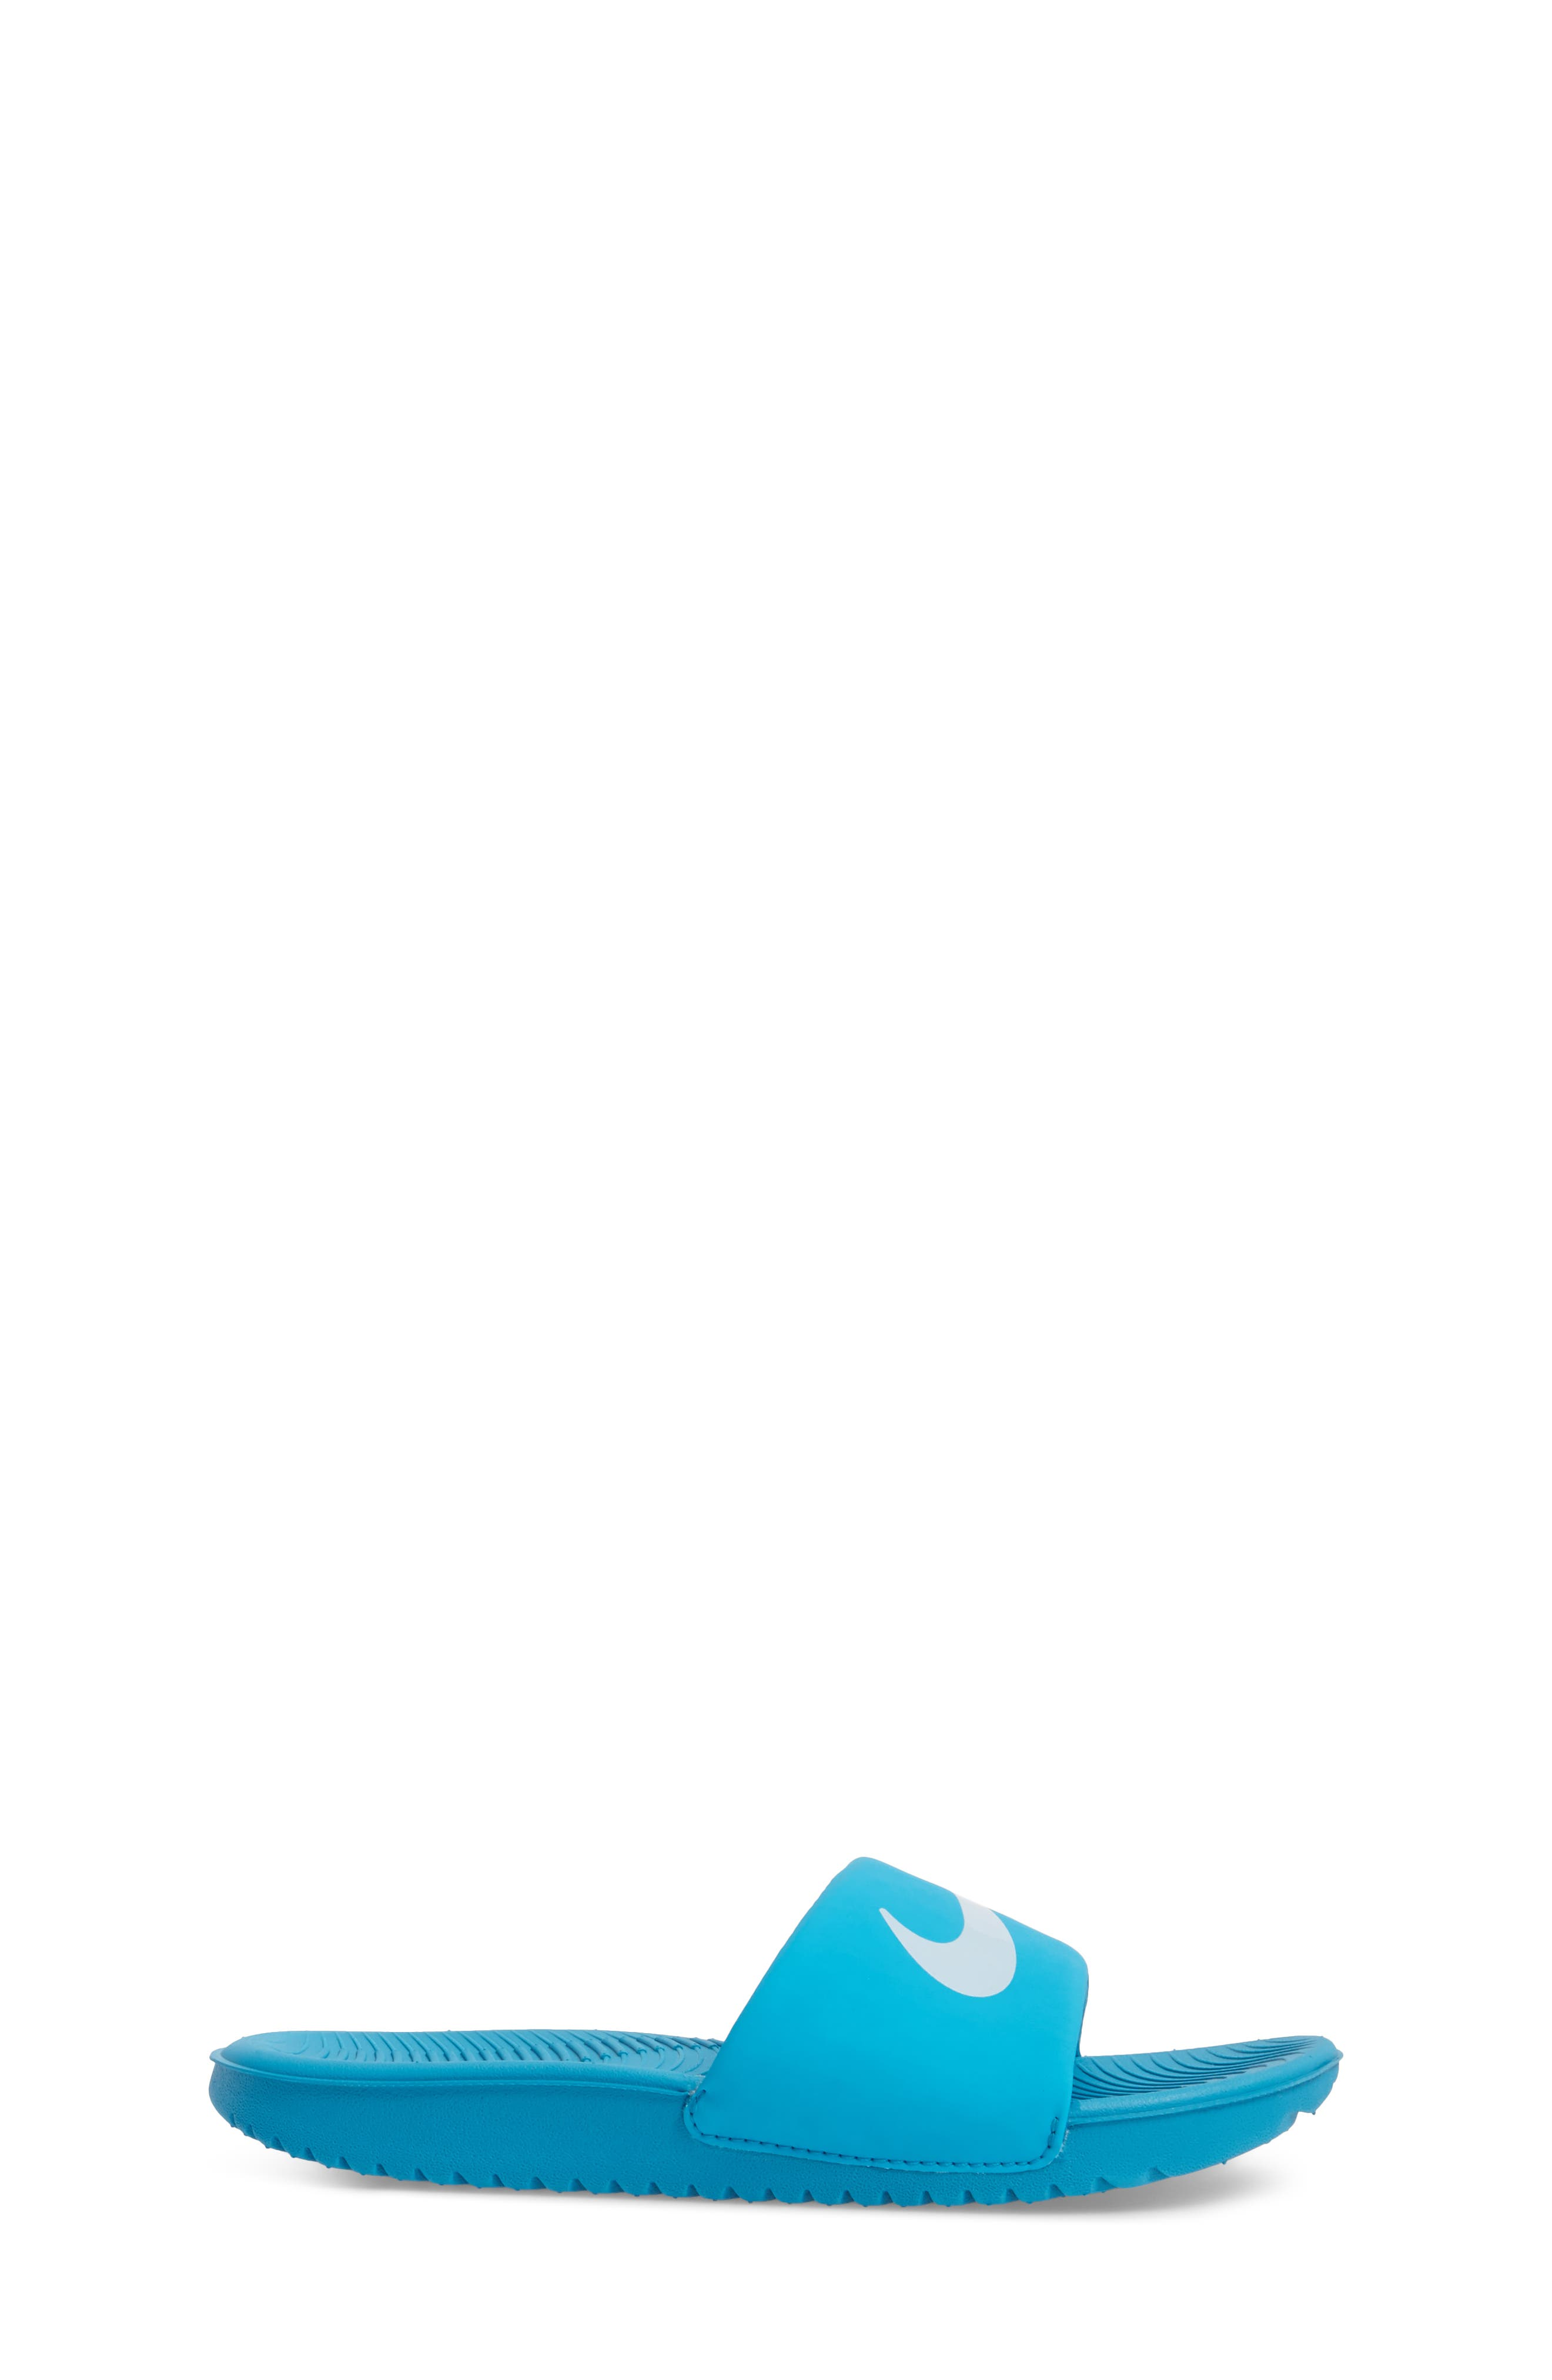 Alternate Image 3  - Nike 'Kawa' Slide Sandal (Toddler, Little Kid & Big Kid)